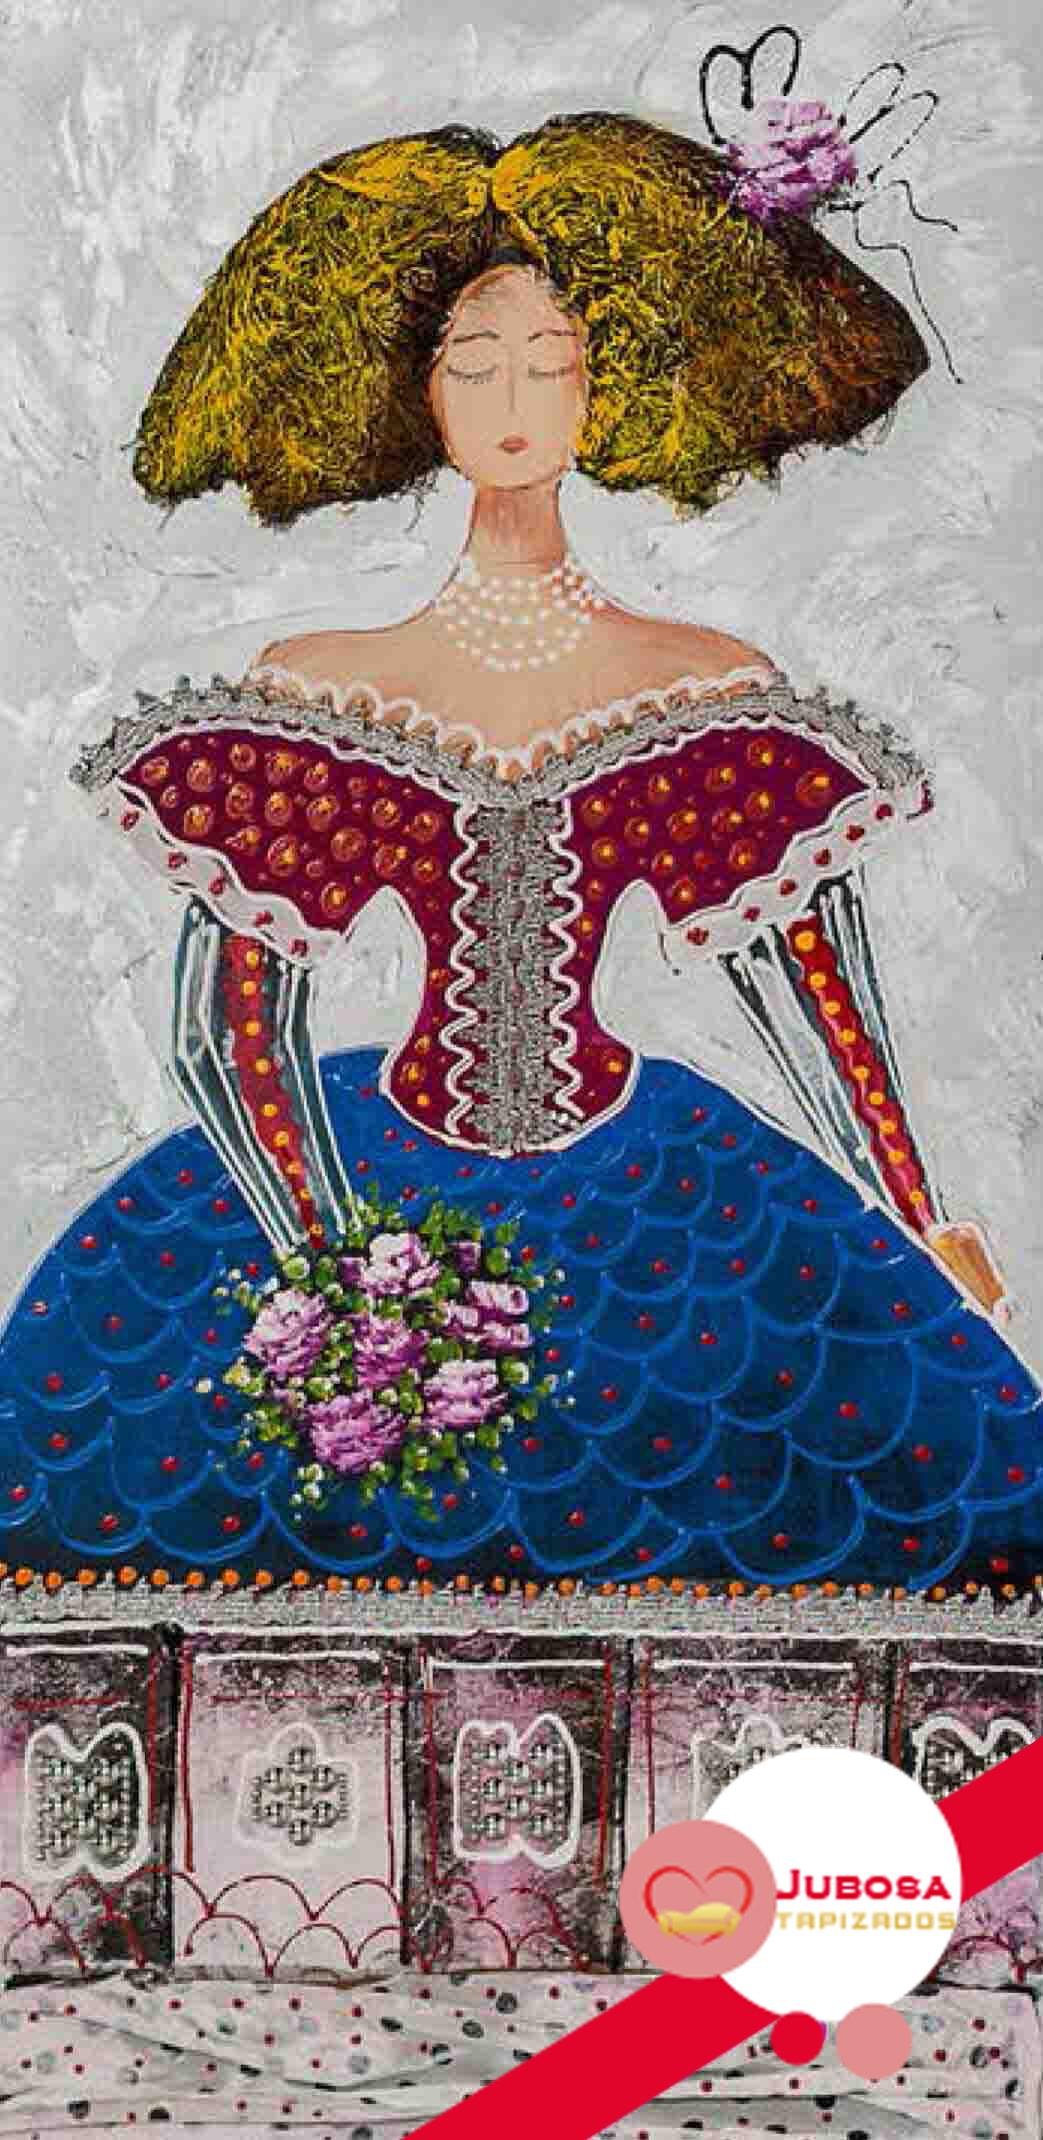 cuadro menina flores tapizados jubosa